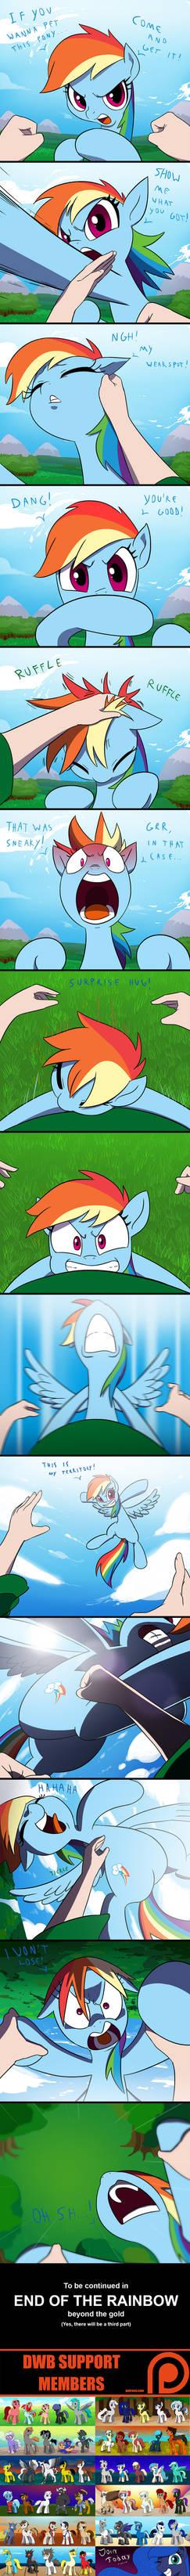 Rainbow Dash Simulator Part 2